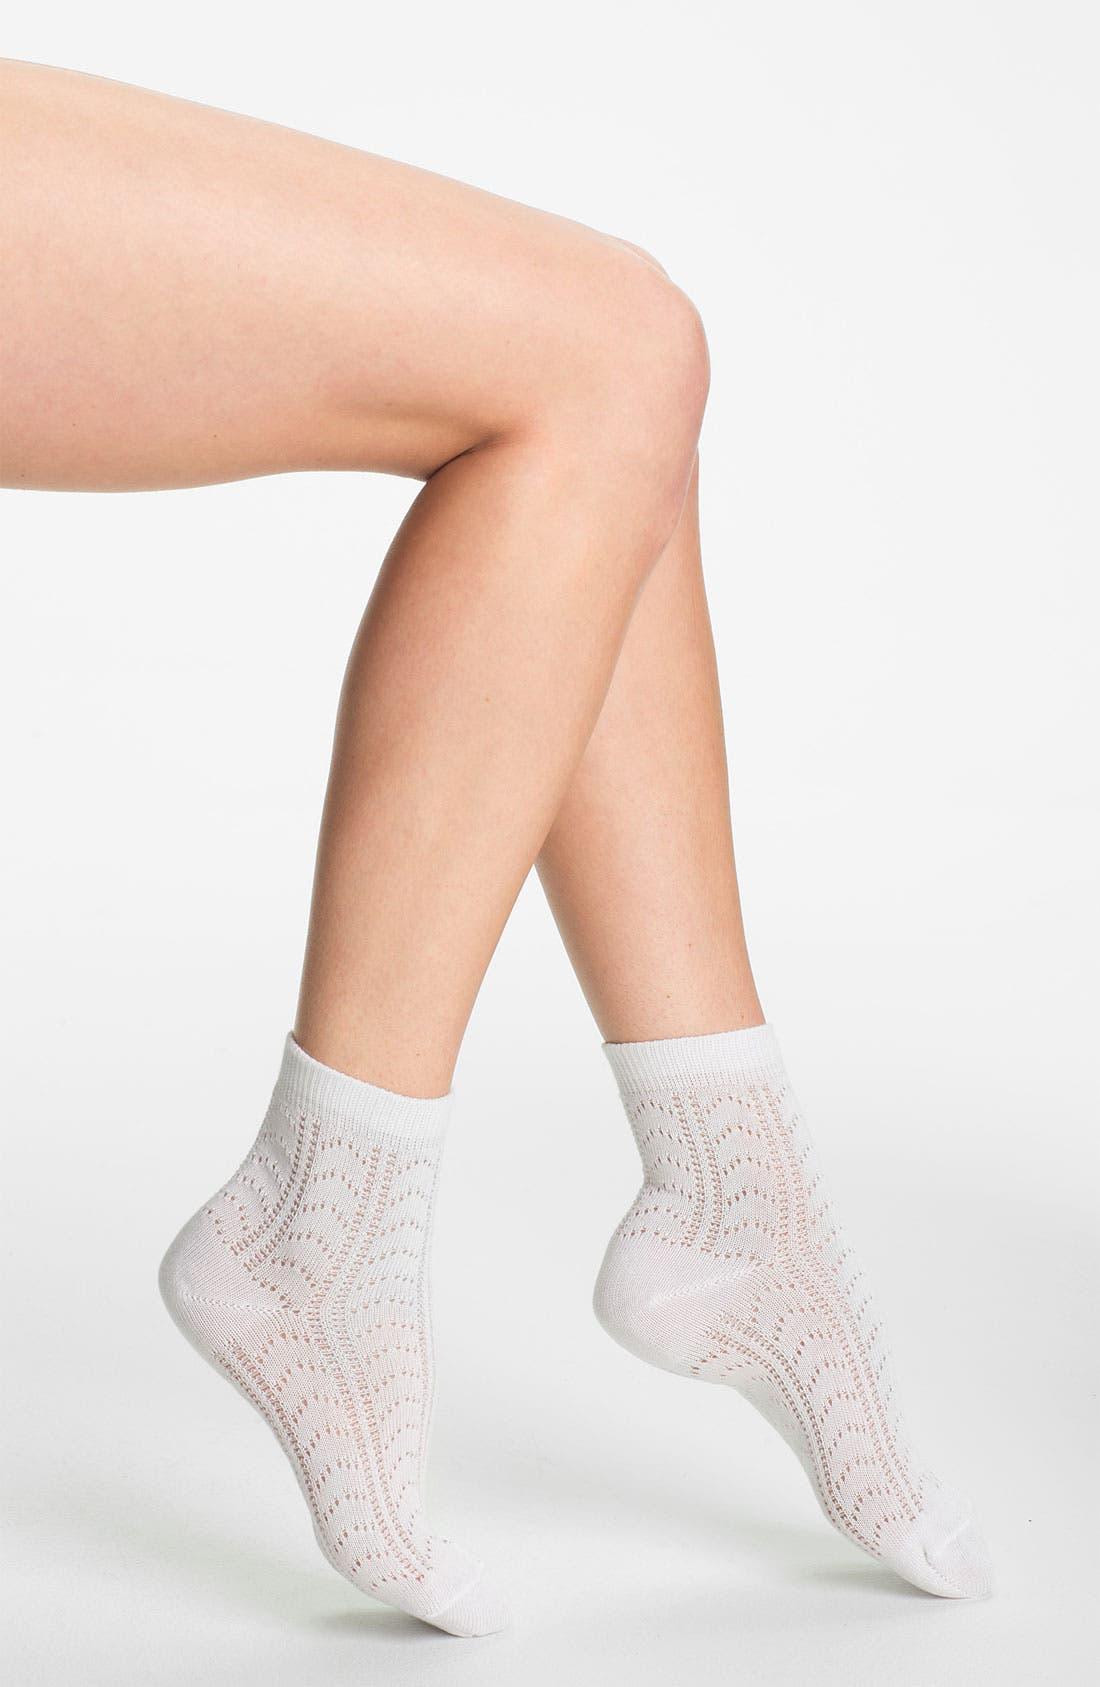 Main Image - Nordstrom 'Dainty Crochet' Anklet